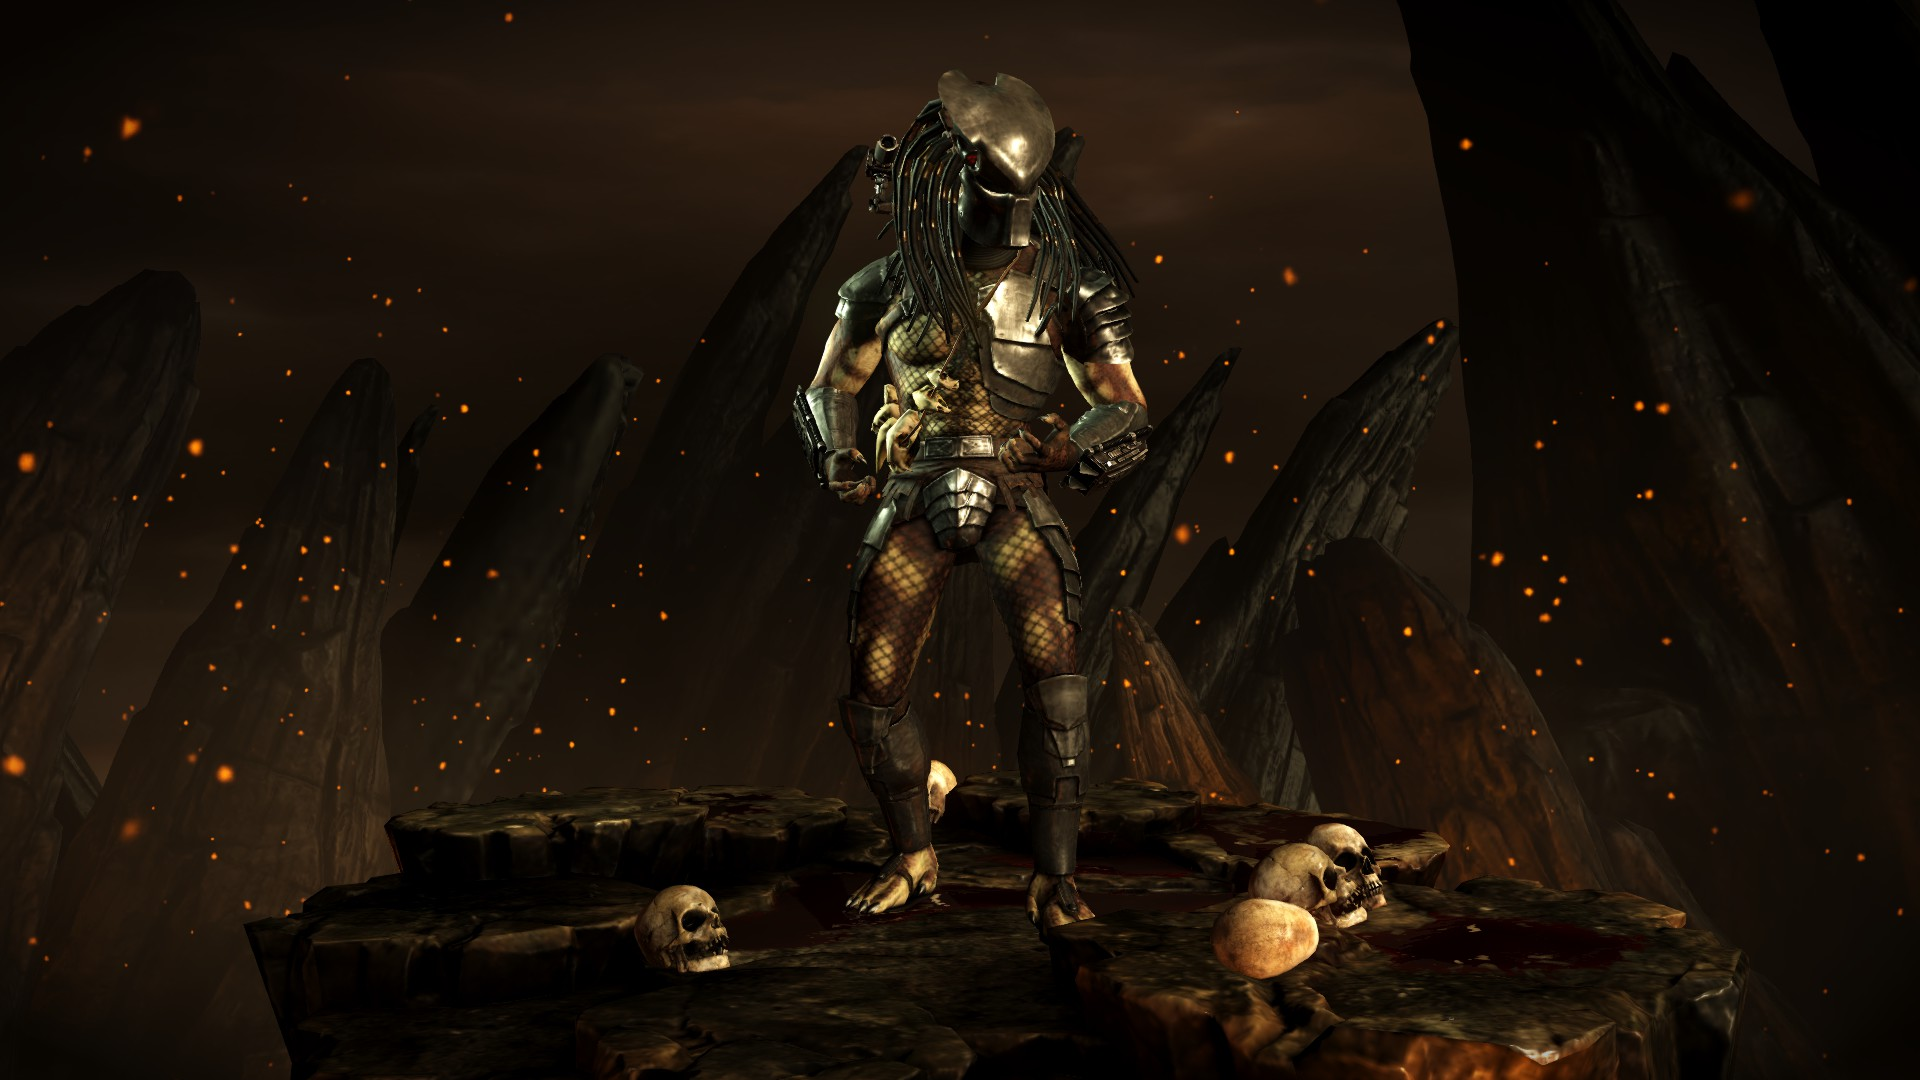 Хищник (Стиль: Хиш-ку-тен) - Mortal Kombat X